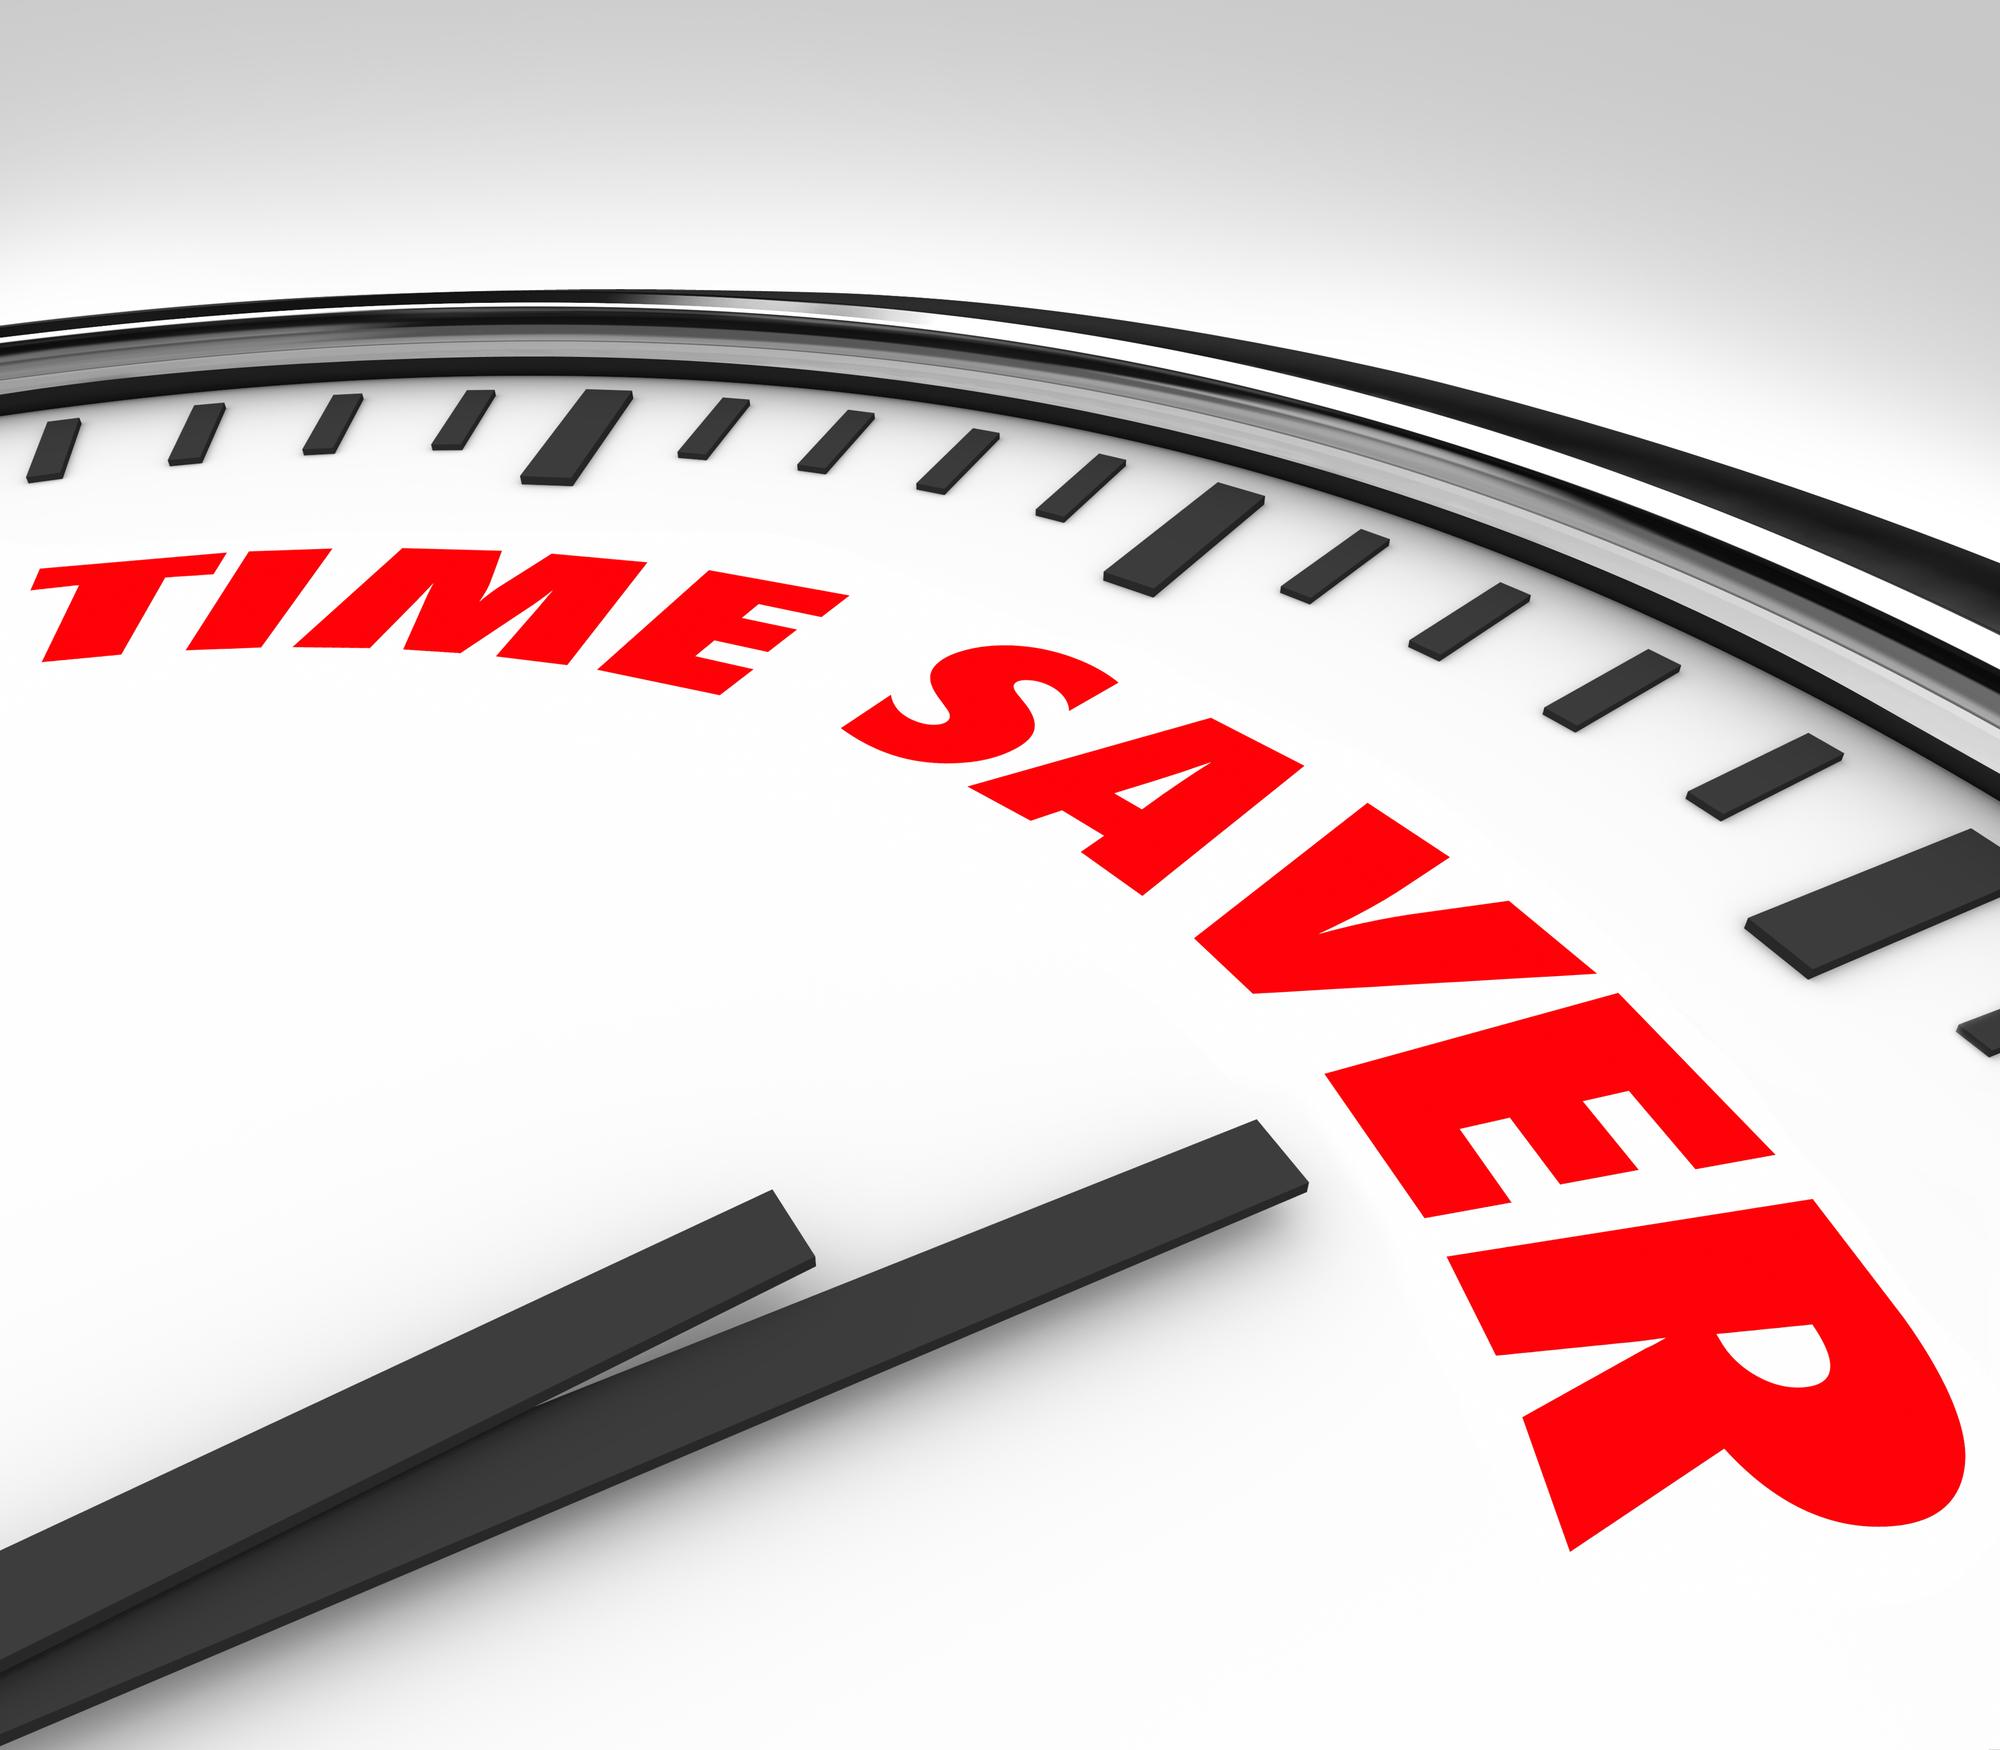 Time Saver Clock Words Efficient Productive Work Advice